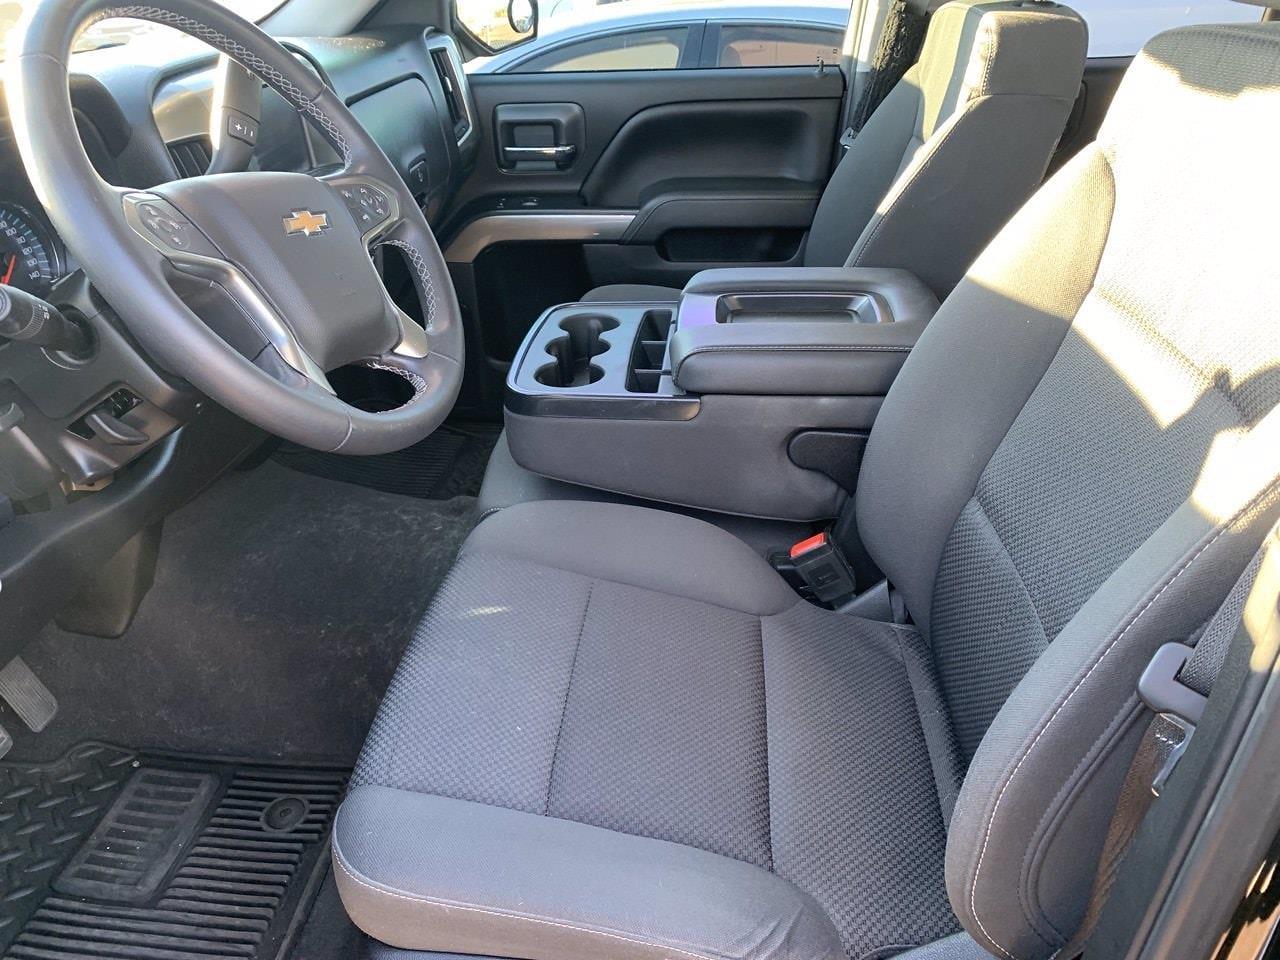 2019 Silverado 1500 Double Cab 4x2,  Pickup #K1115637 - photo 8